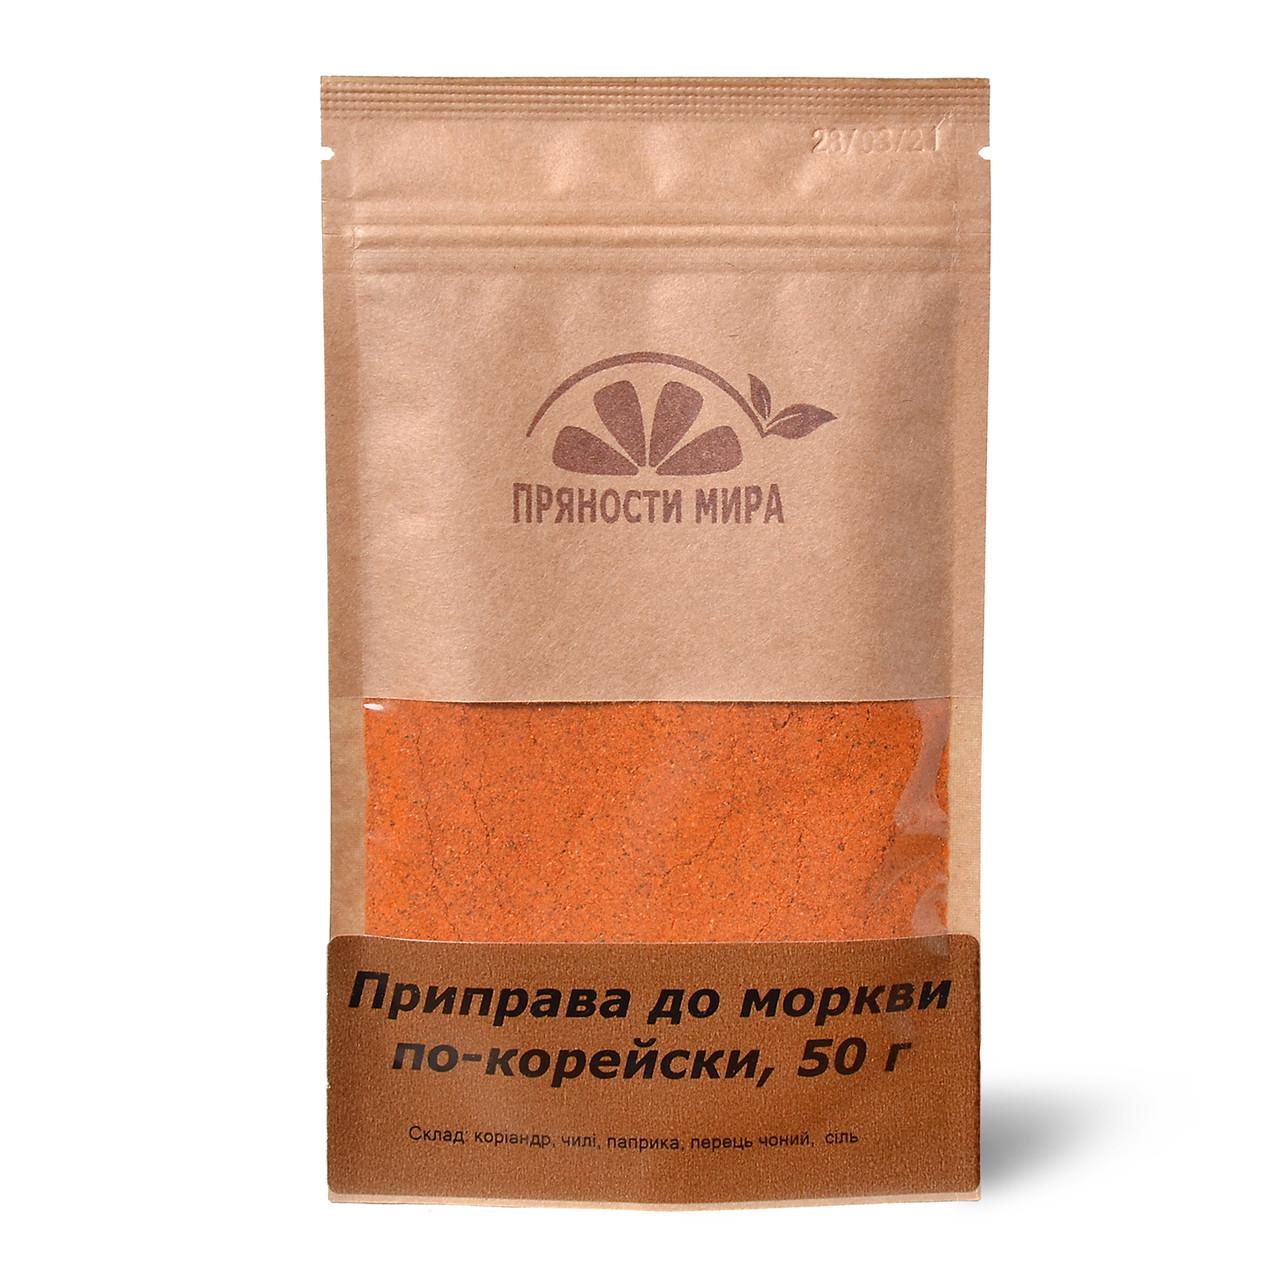 Приправа для моркови по-корейски 50 г